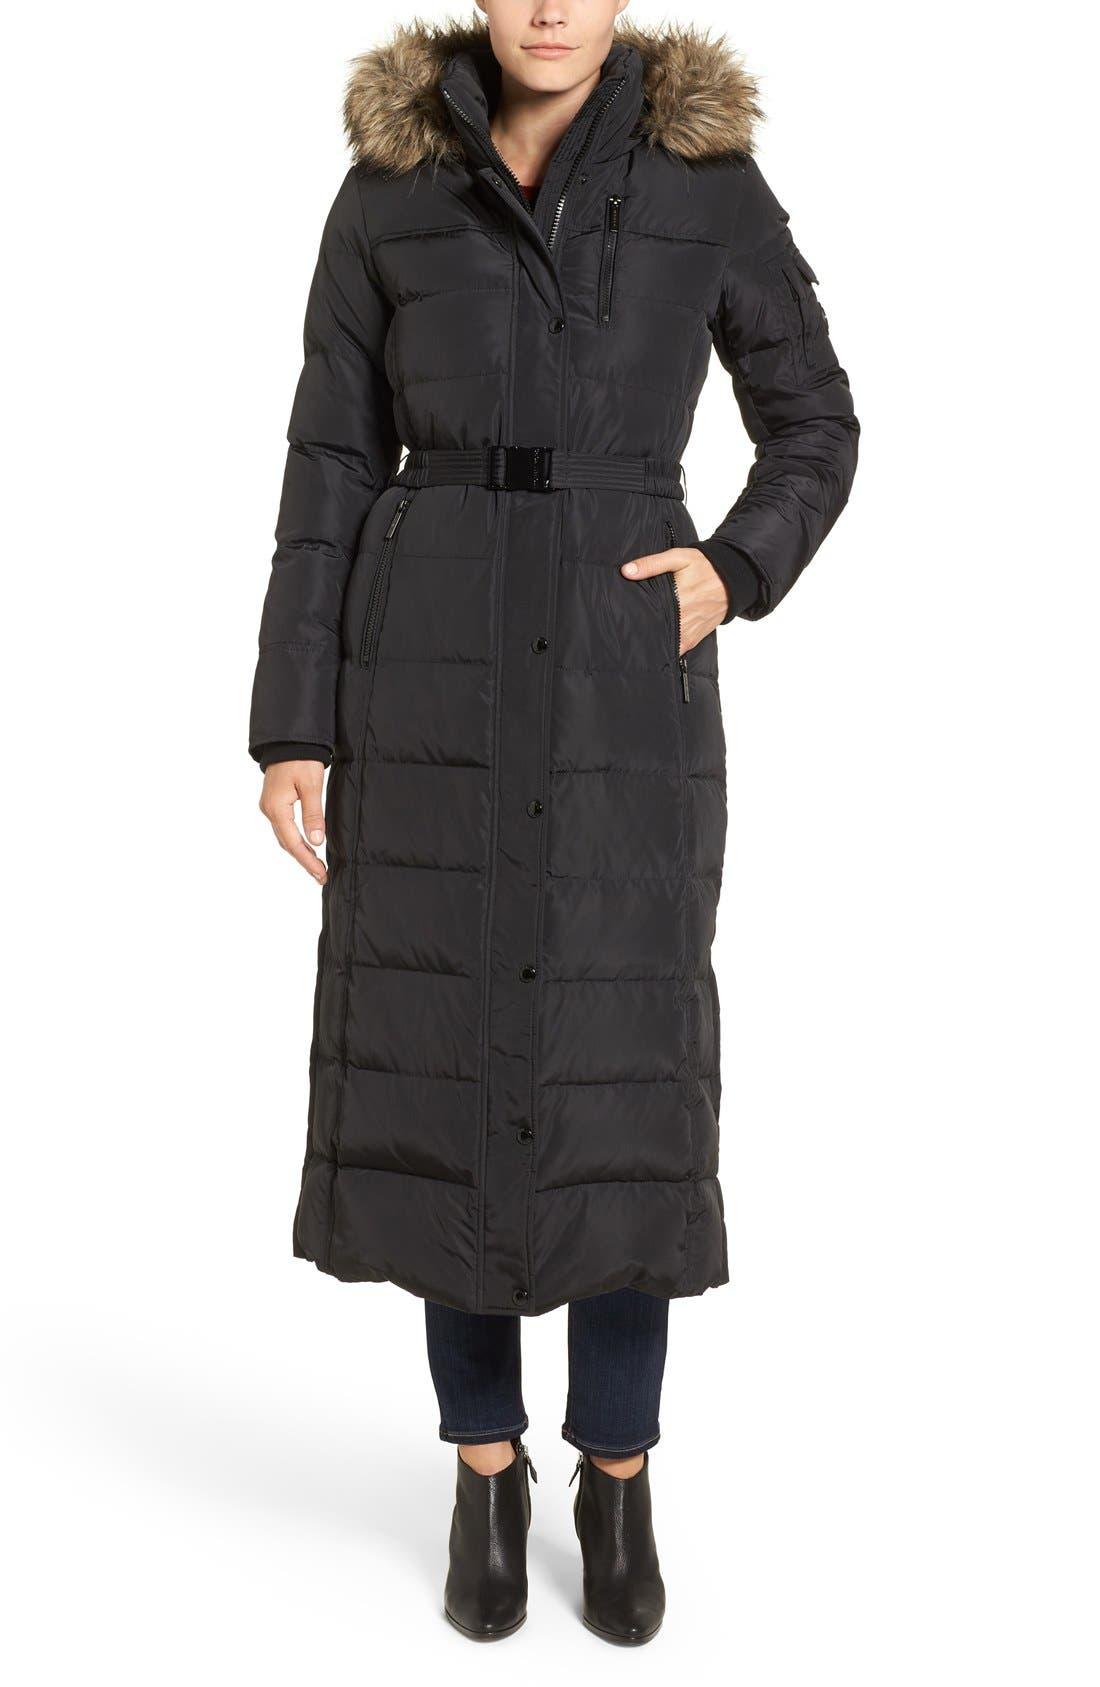 KORS MICHAEL KORS, Faux Fur Trim Belted Down & Feather Fill Maxi Coat, Main thumbnail 1, color, 001